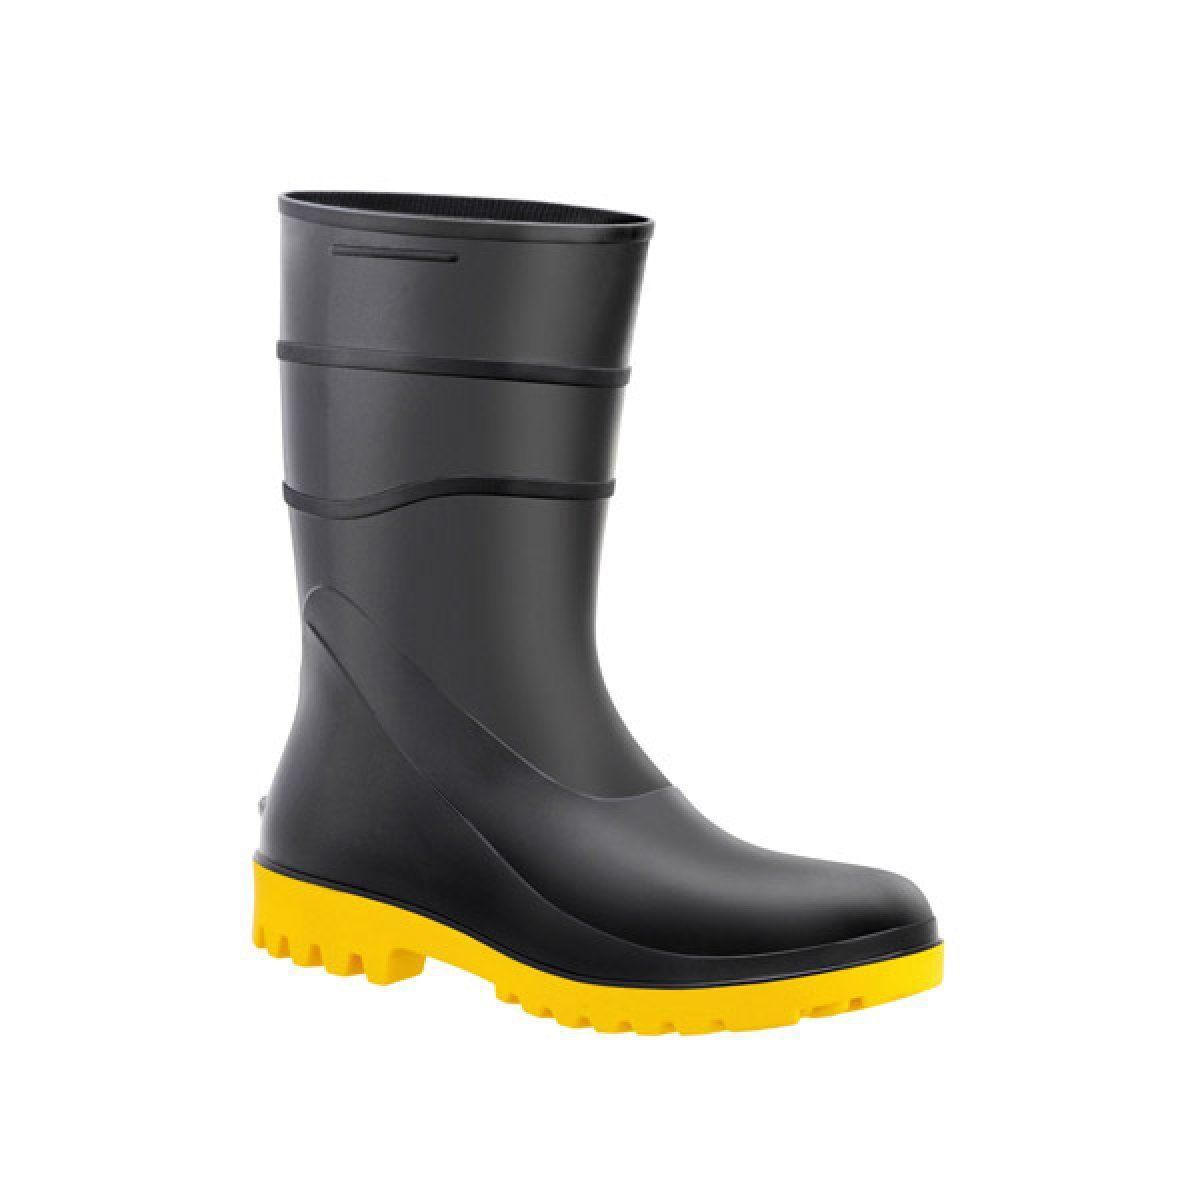 Bota de PVC Preta c/ Solado Amarelo N°35 - BRACOL